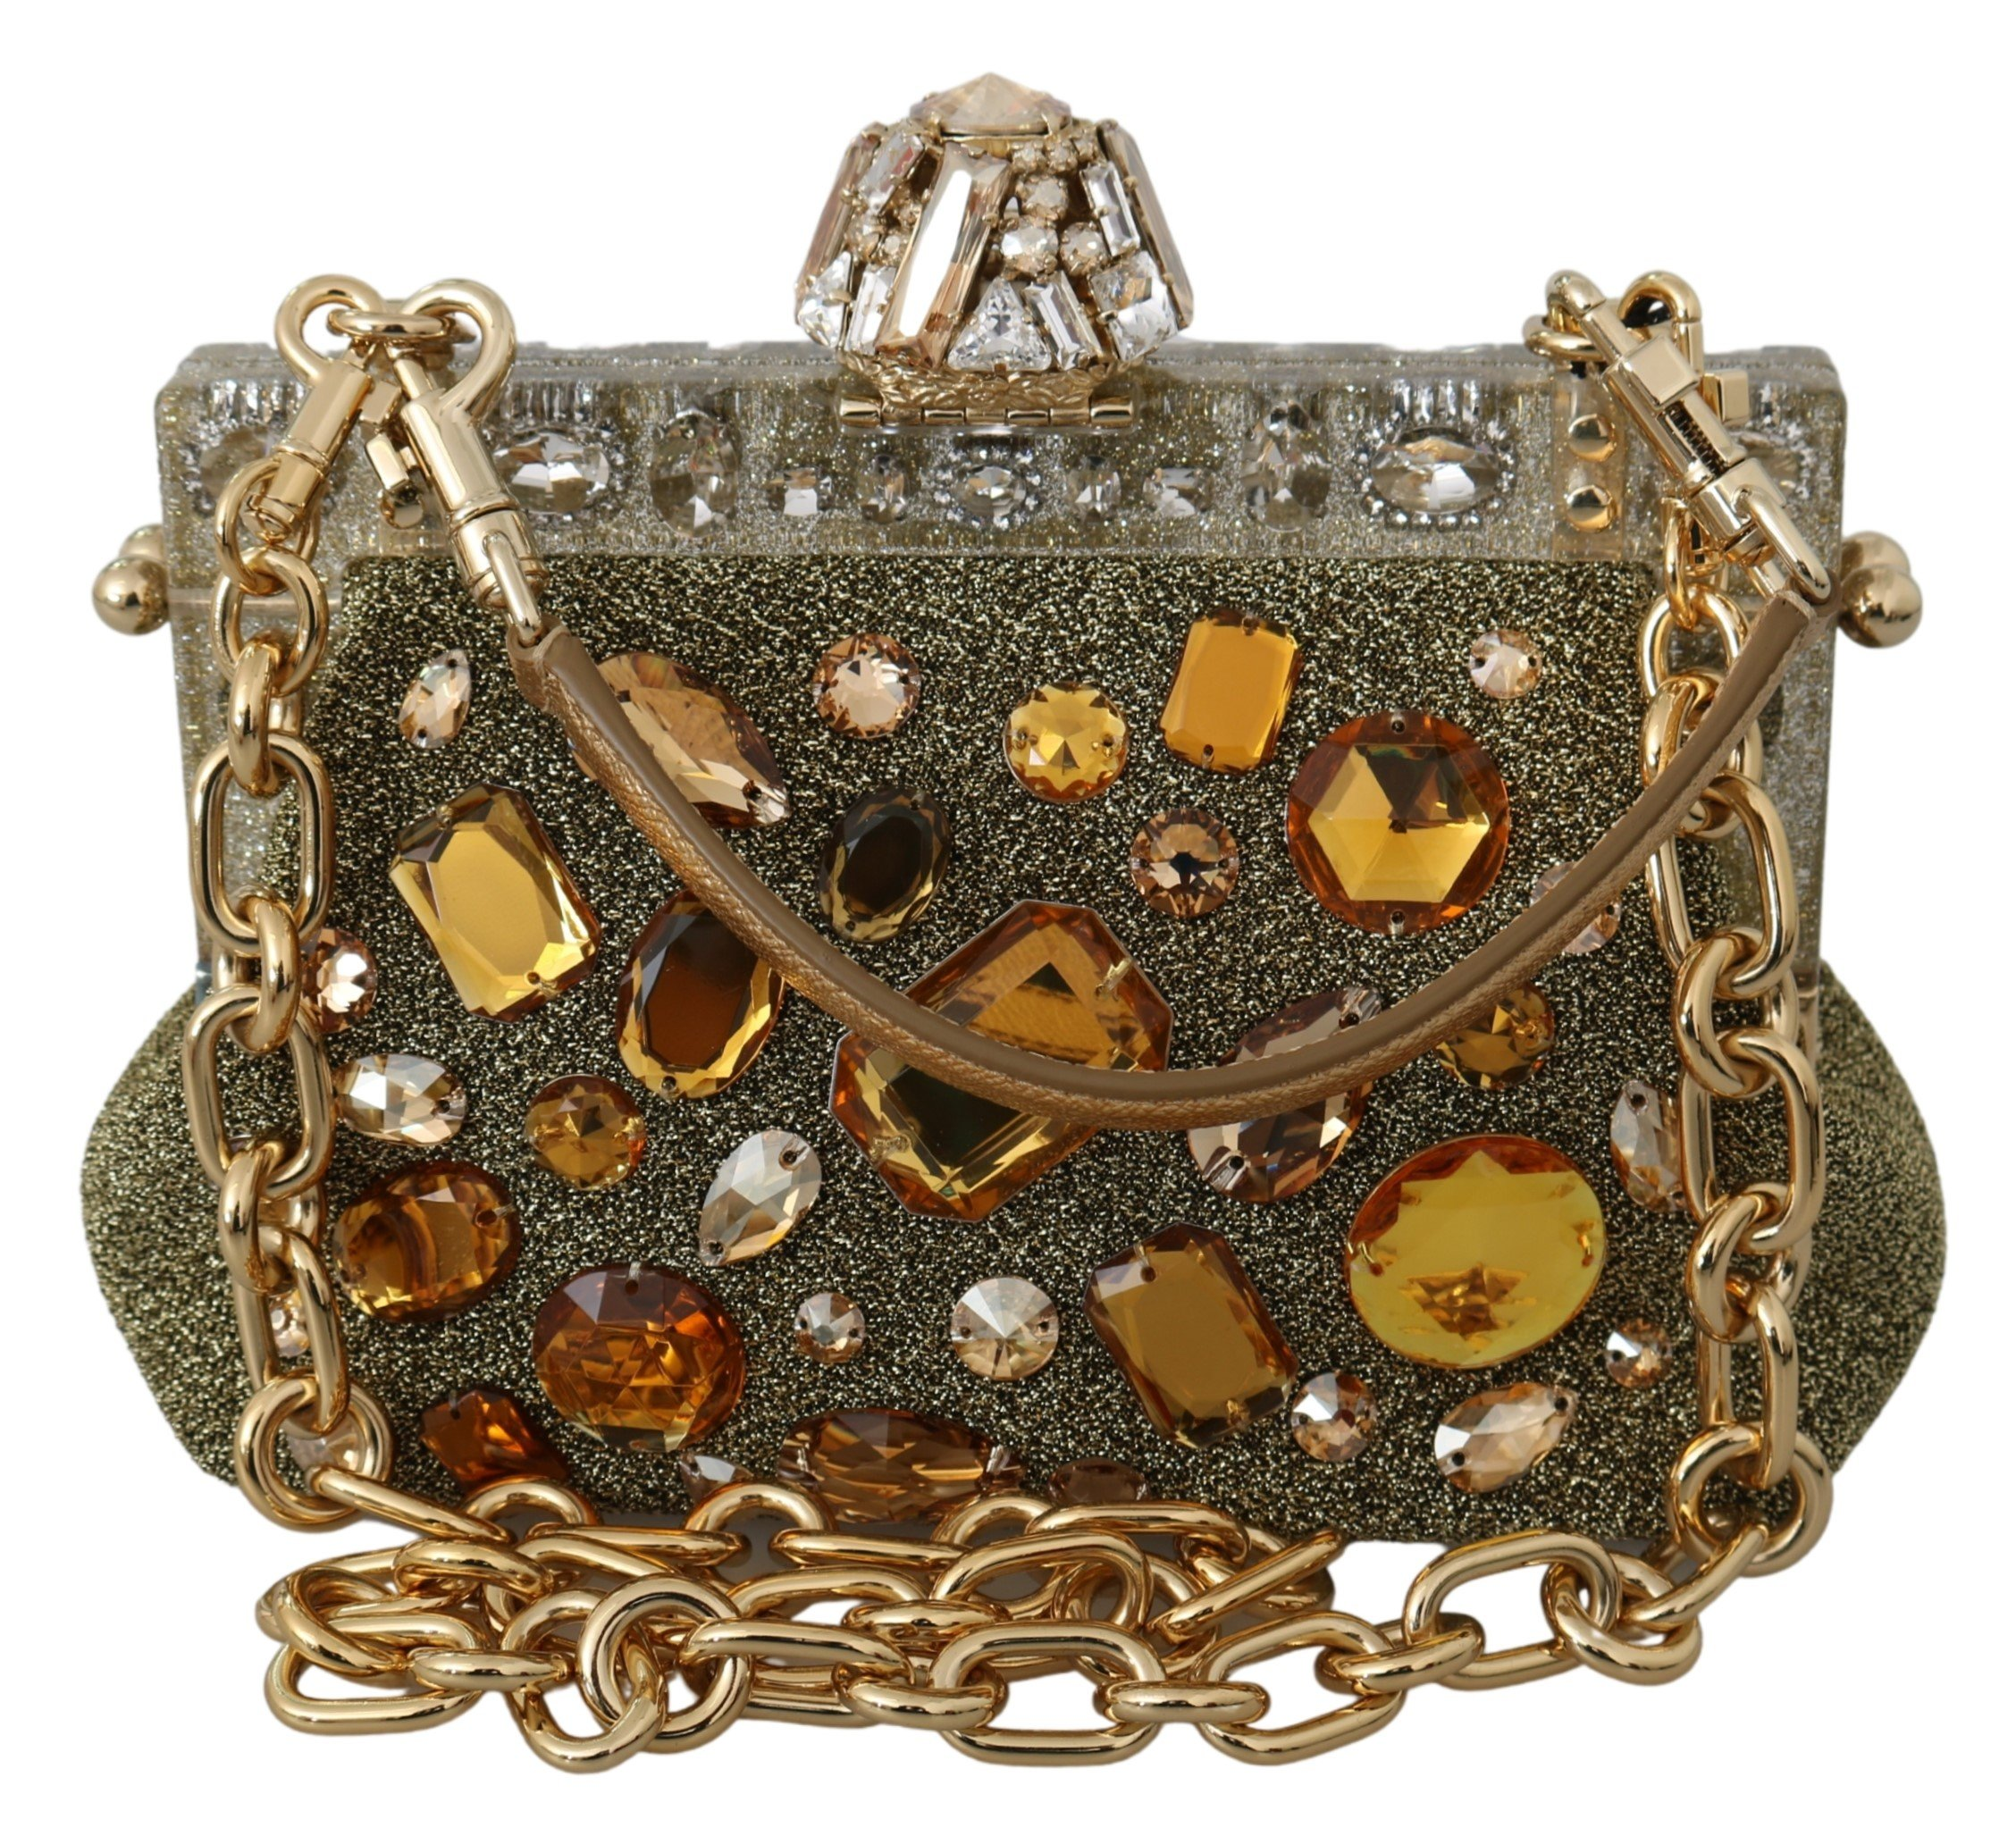 Dolce & Gabbana Women's VANDA Crystal Clutch Bag Gold VAS9715